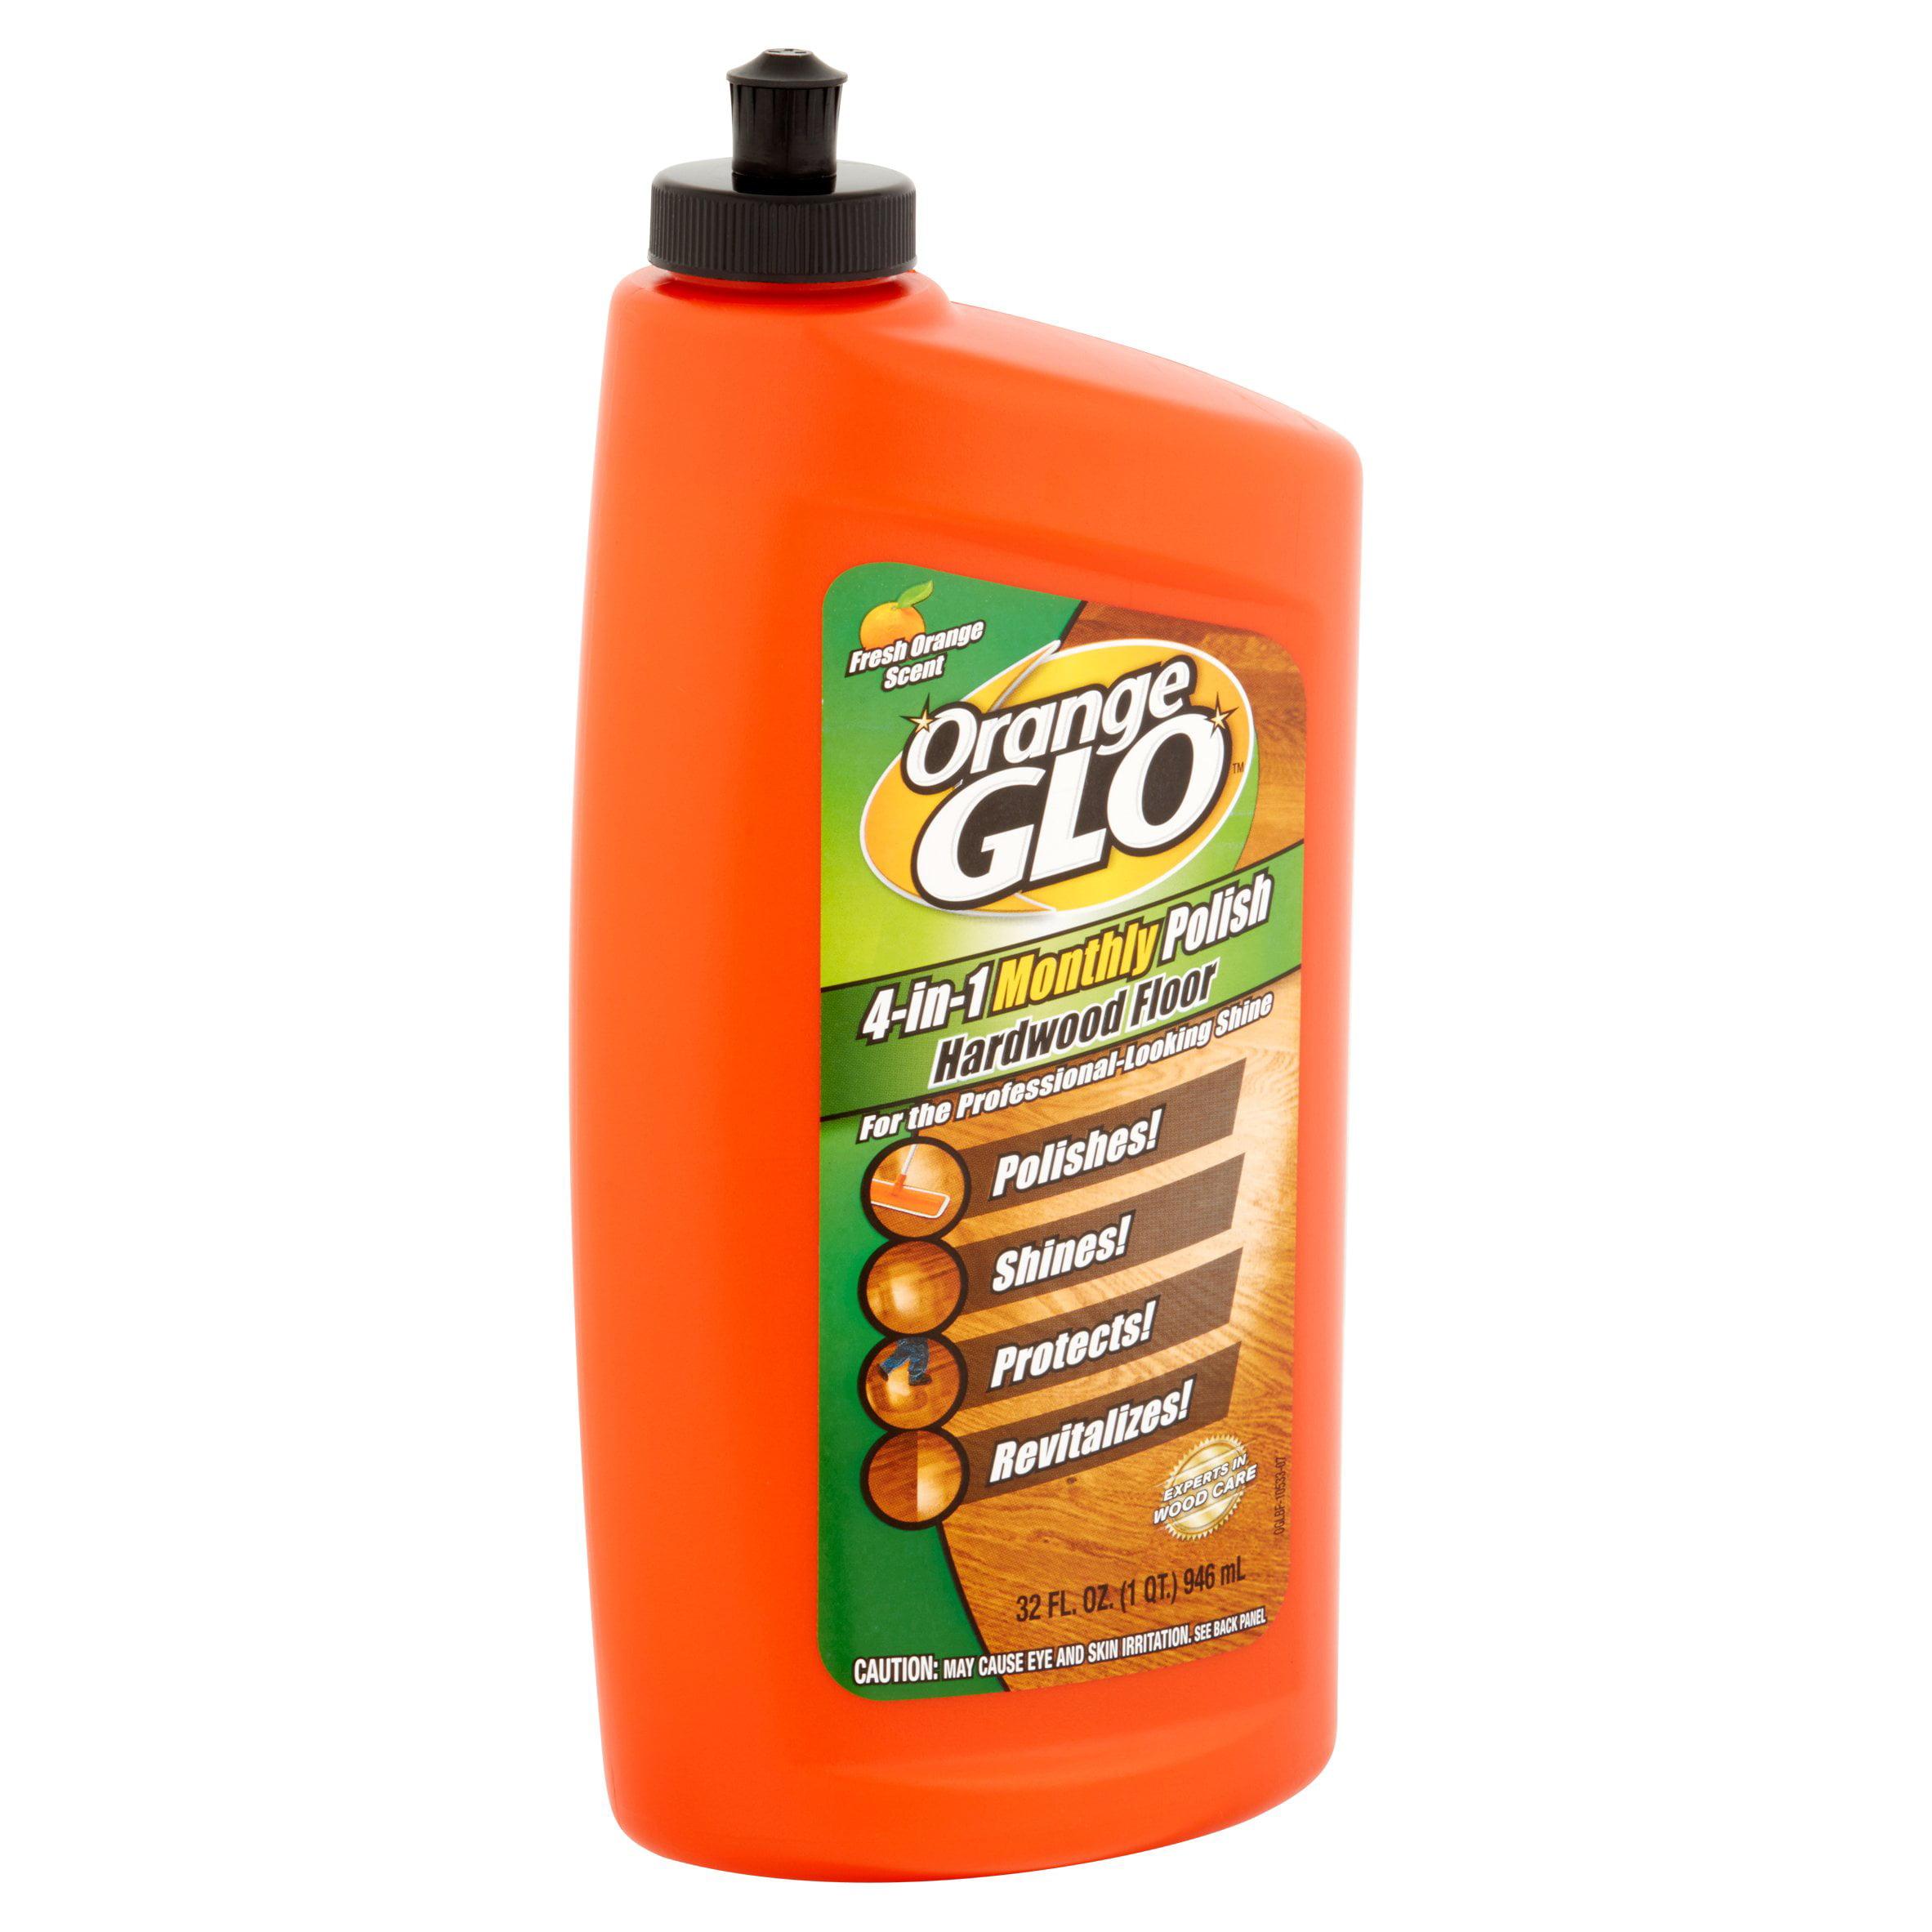 Orange Glo Hardwood Floor Polish, Orange Scent, 32oz Bottle